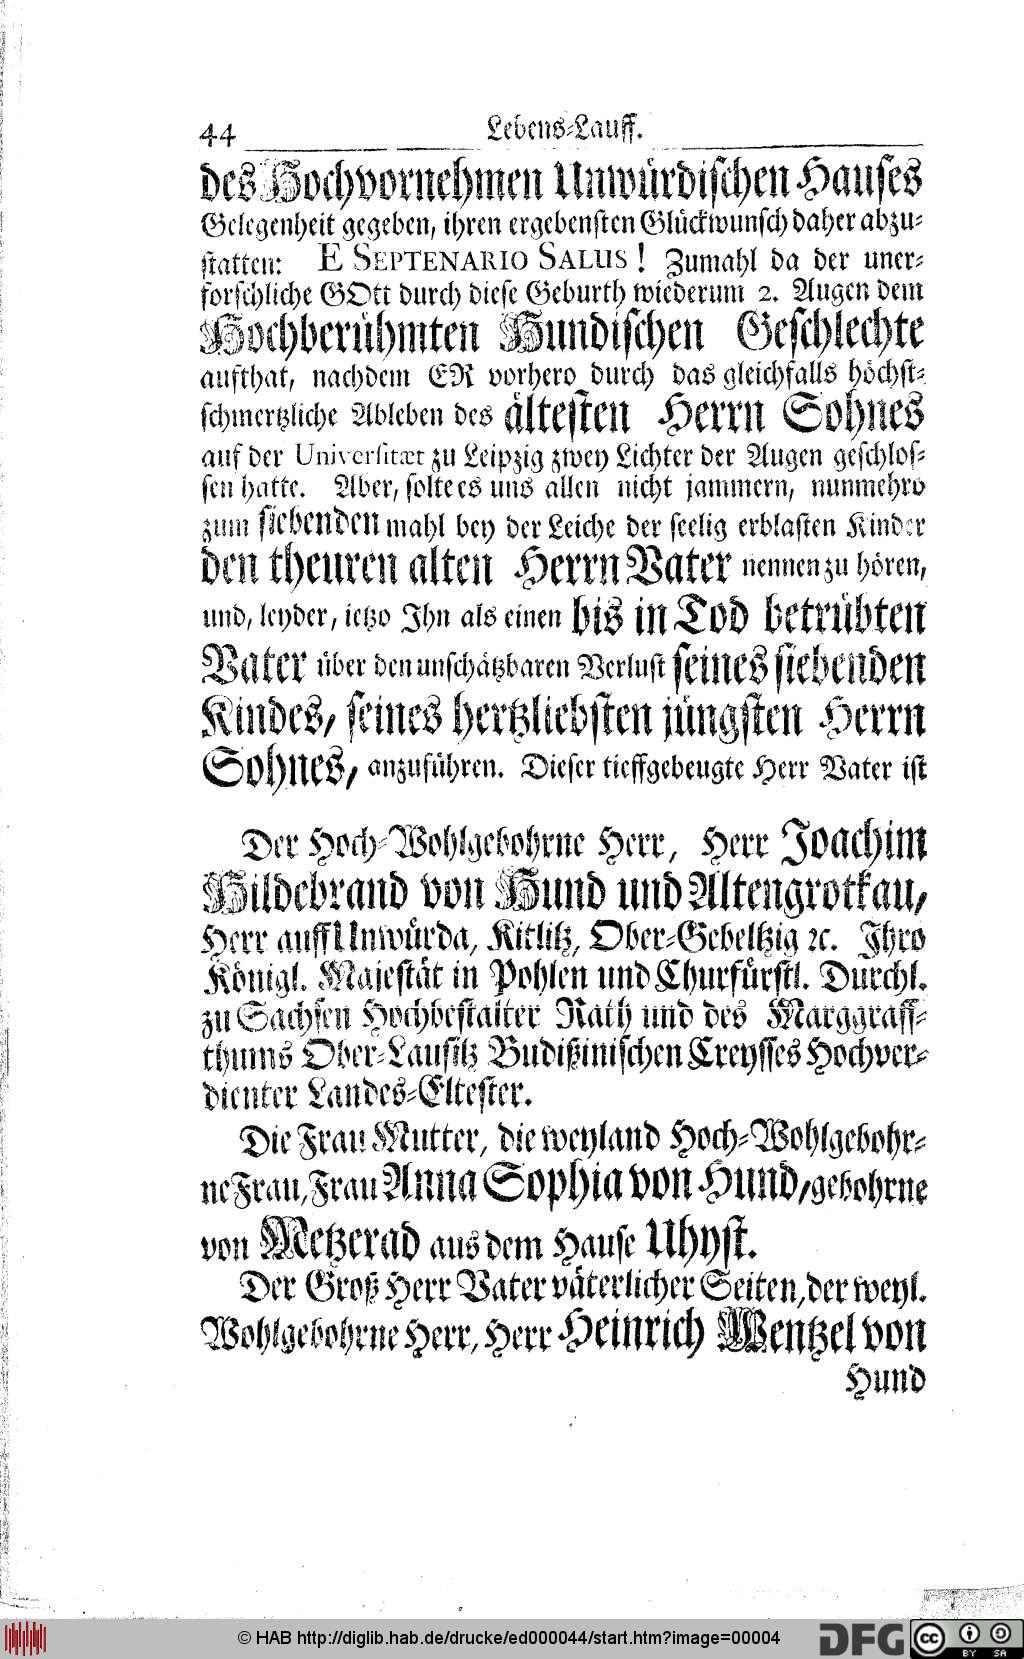 http://diglib.hab.de/drucke/ed000044/00004.jpg